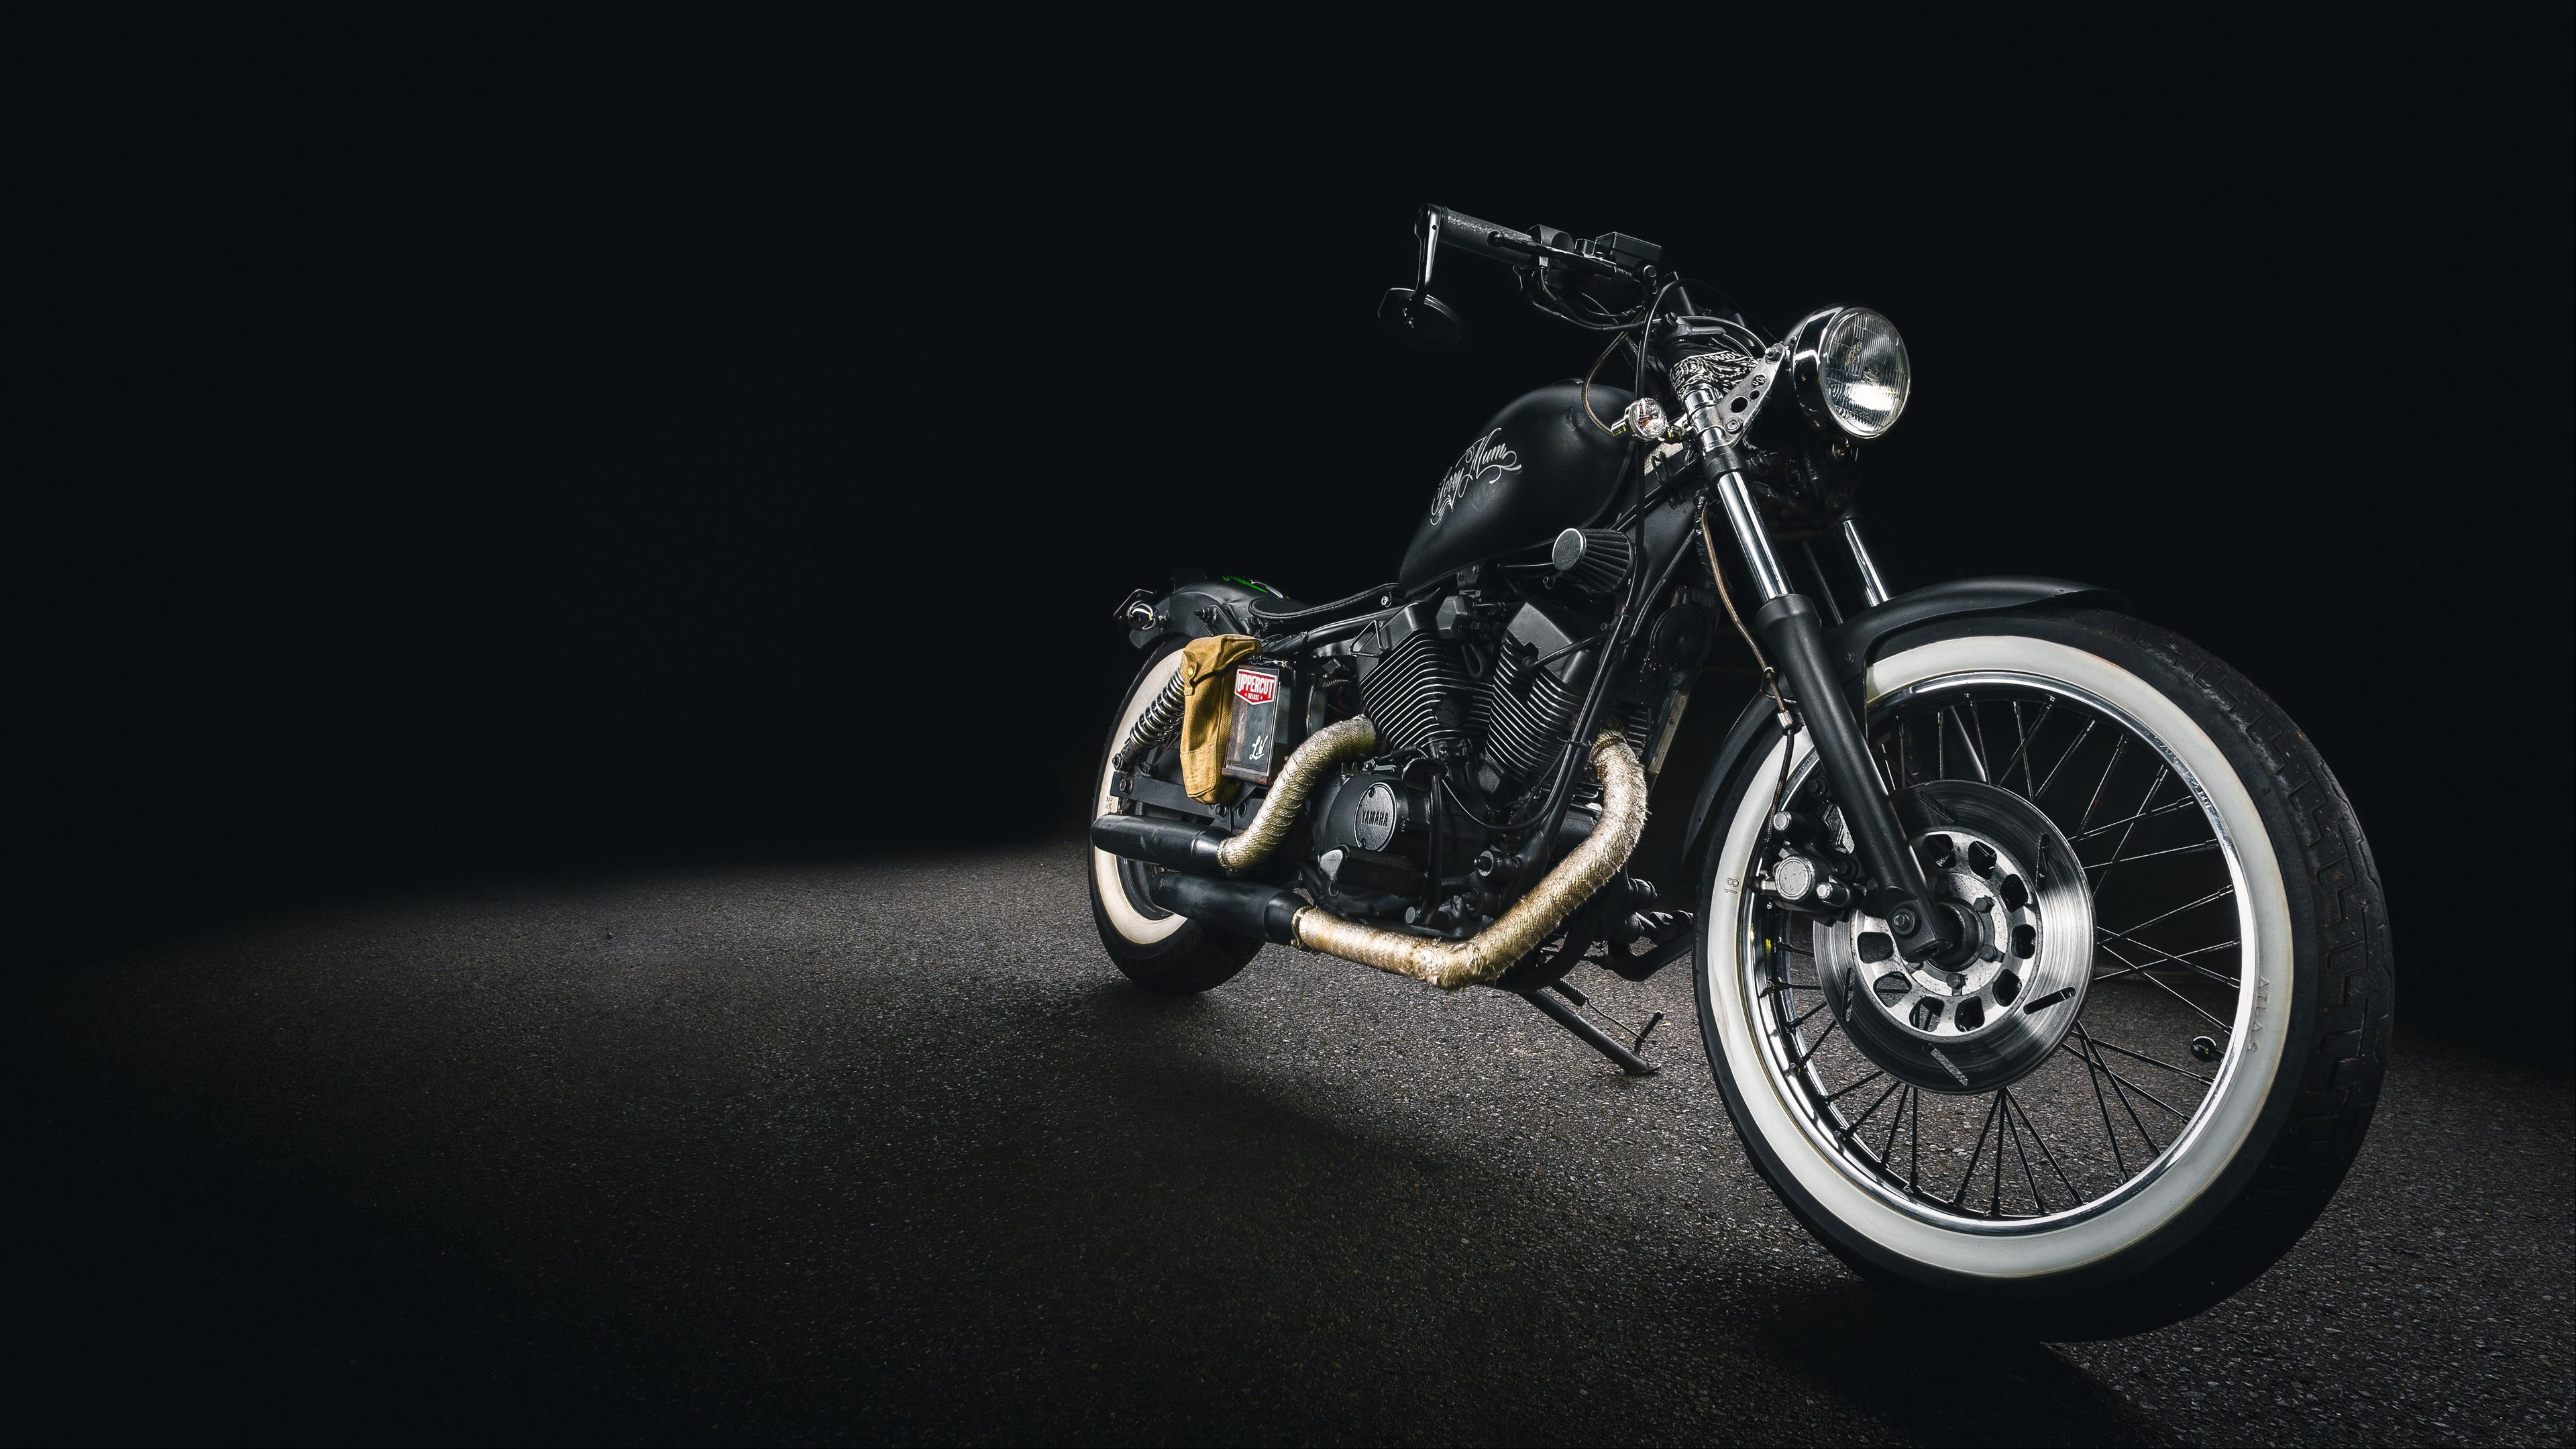 motorcycle bike wheel 4k 1536018367 - motorcycle, bike, wheel 4k - Wheel, Motorcycle, Bike